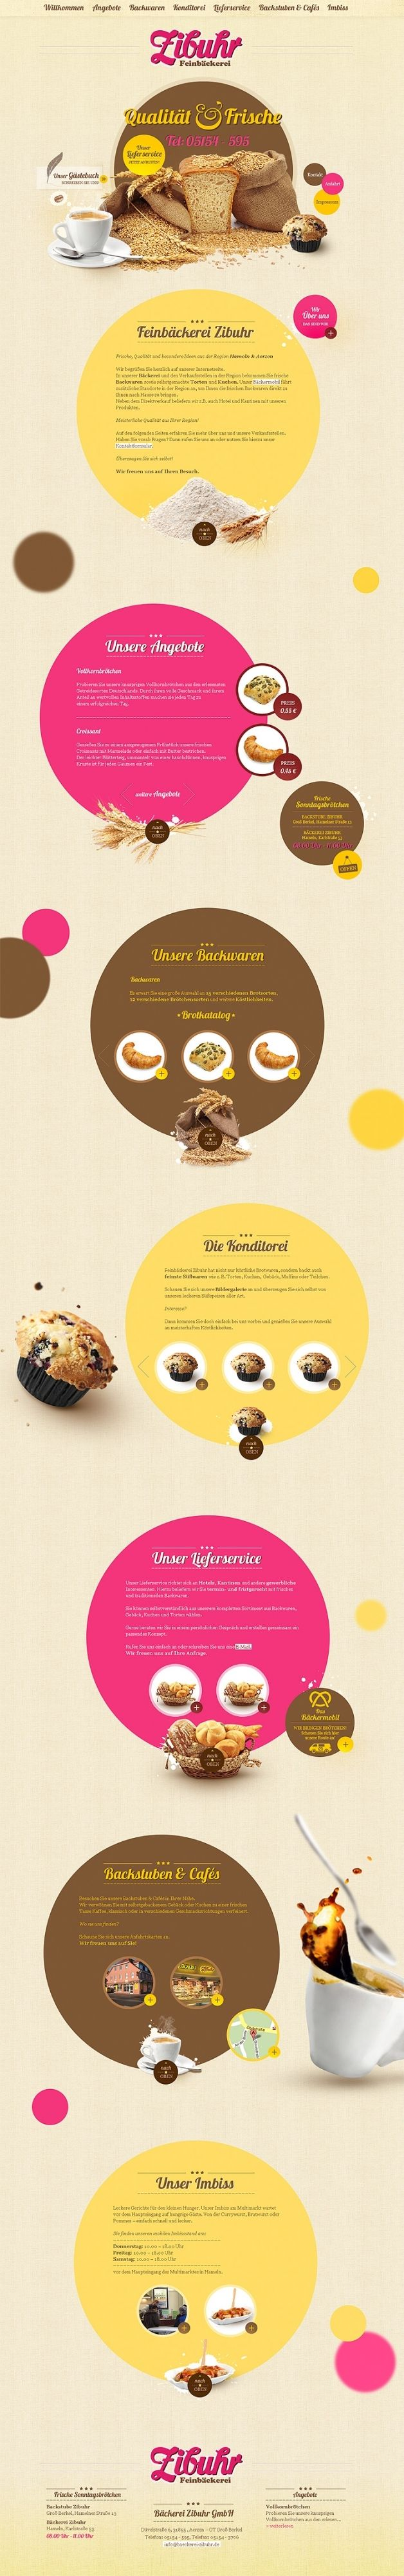 #webdesign #inspiration #bakery #cupcake | #webdesign #it #web #design #layout #userinterface #website #site < repinned by www.BlickeDeeler.de | Take a look at www.WebsiteDesign-Hamburg.de